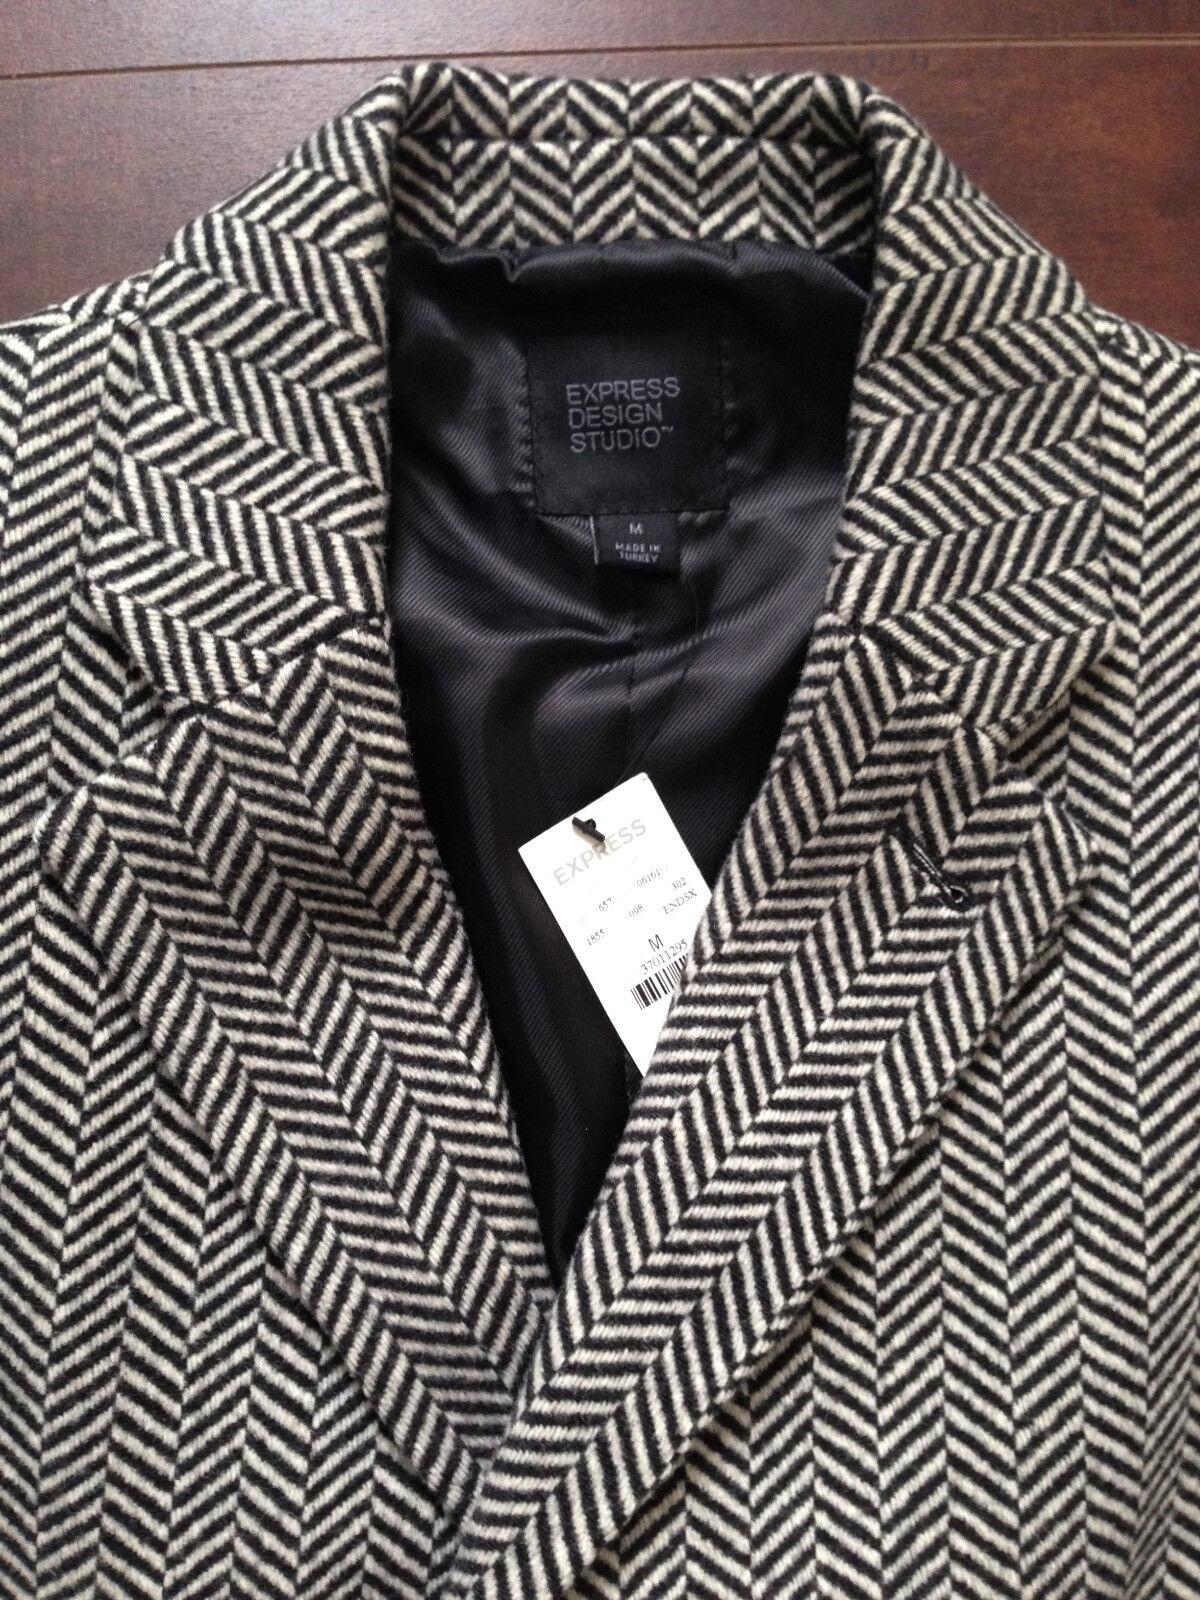 BNWT Express Design Studio men's herringbone wool dress coat (M)